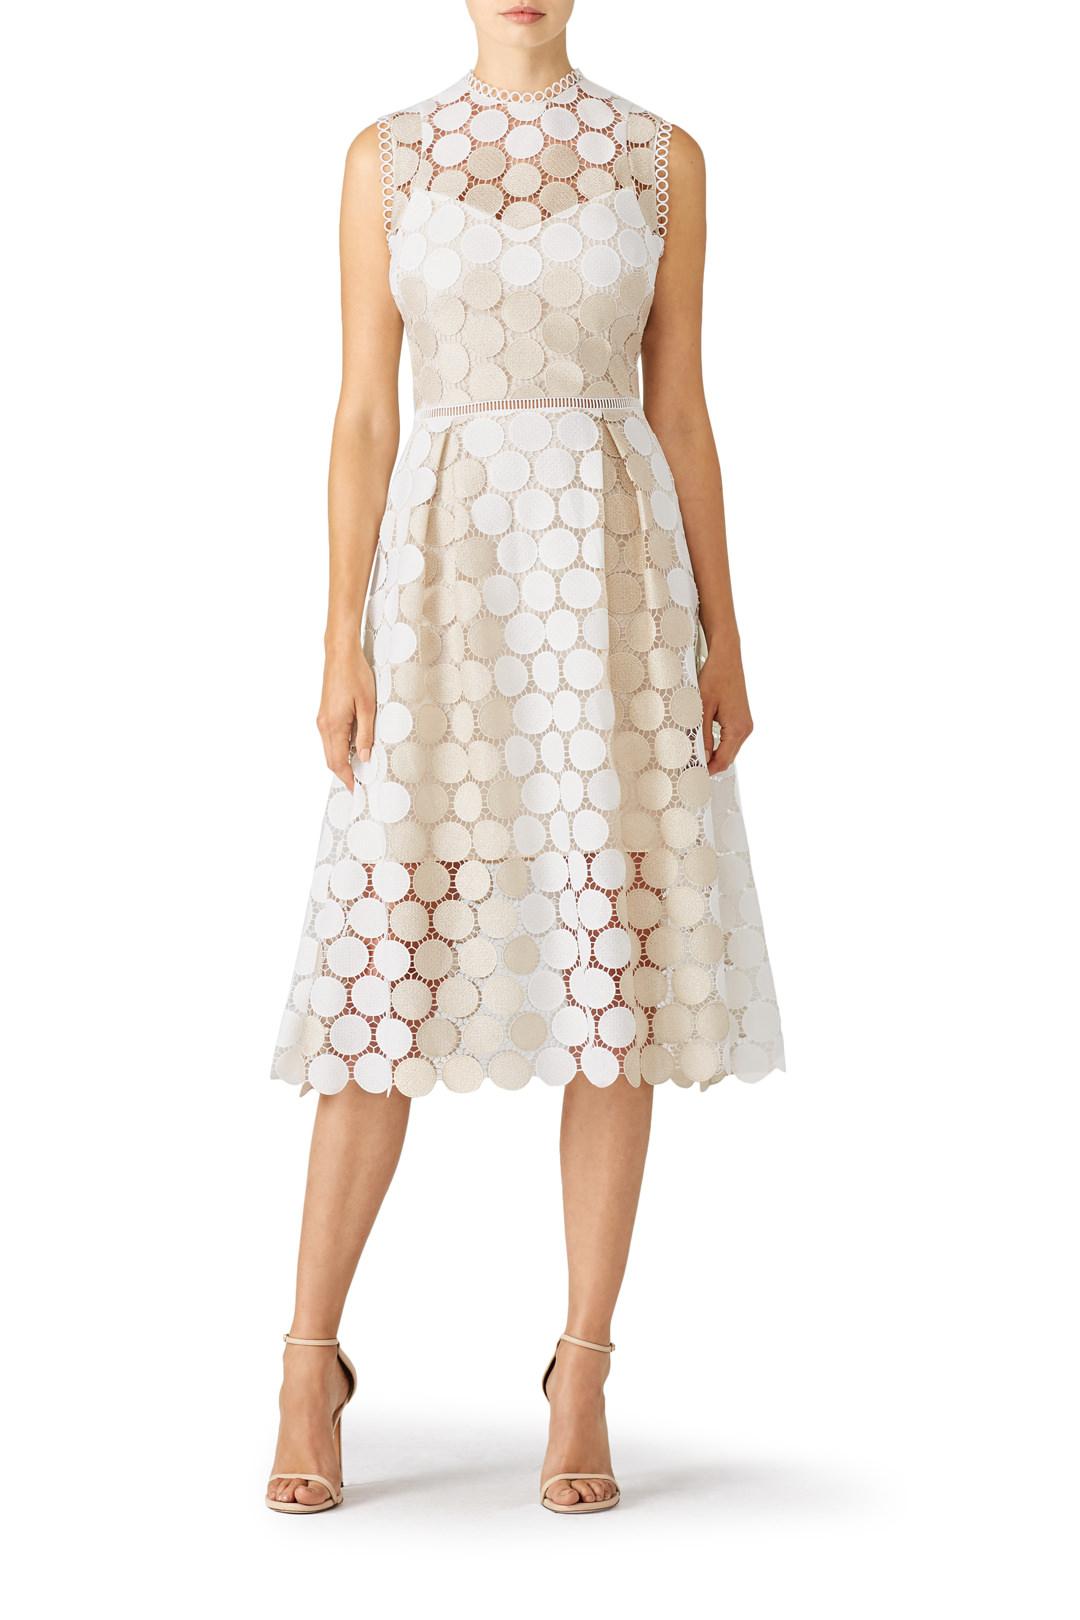 Shoshanna Glengarry Dress